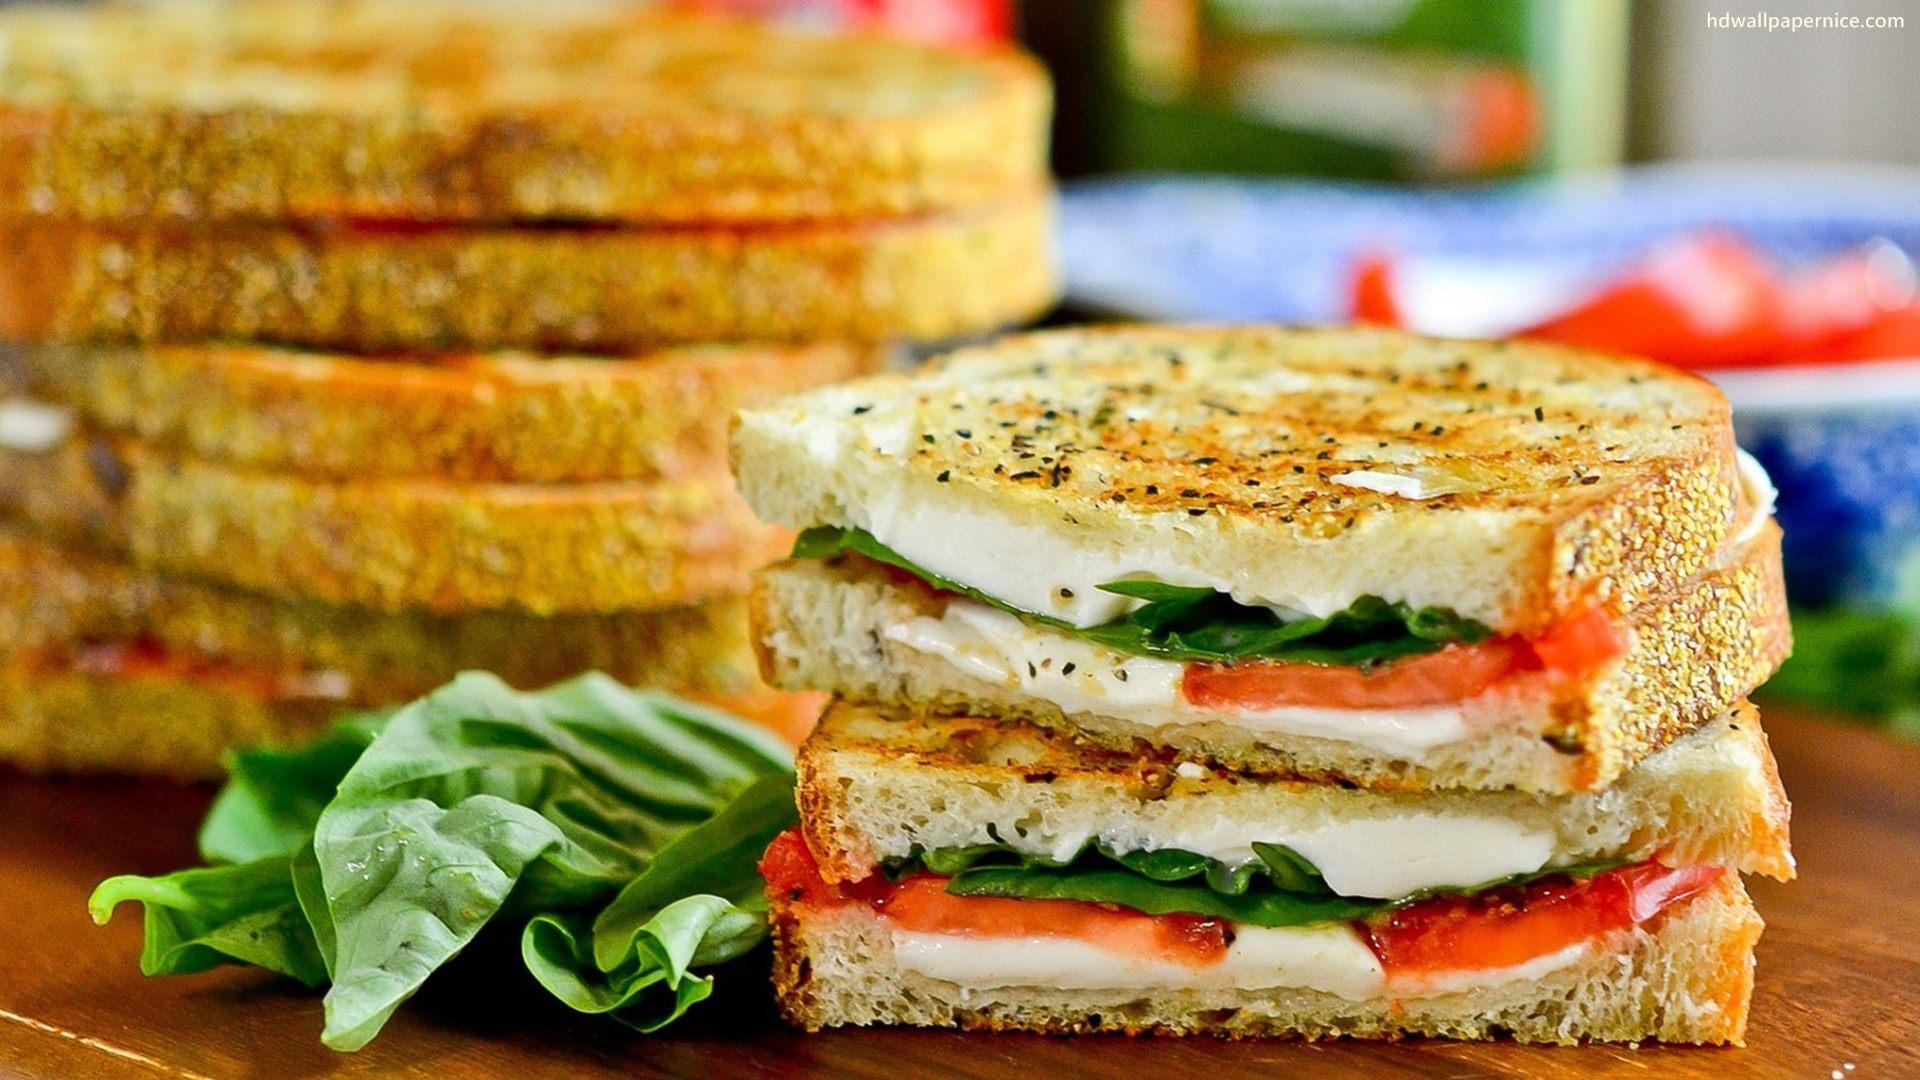 Sandwich Hd 1920x1080 Wallpaper Teahub Io